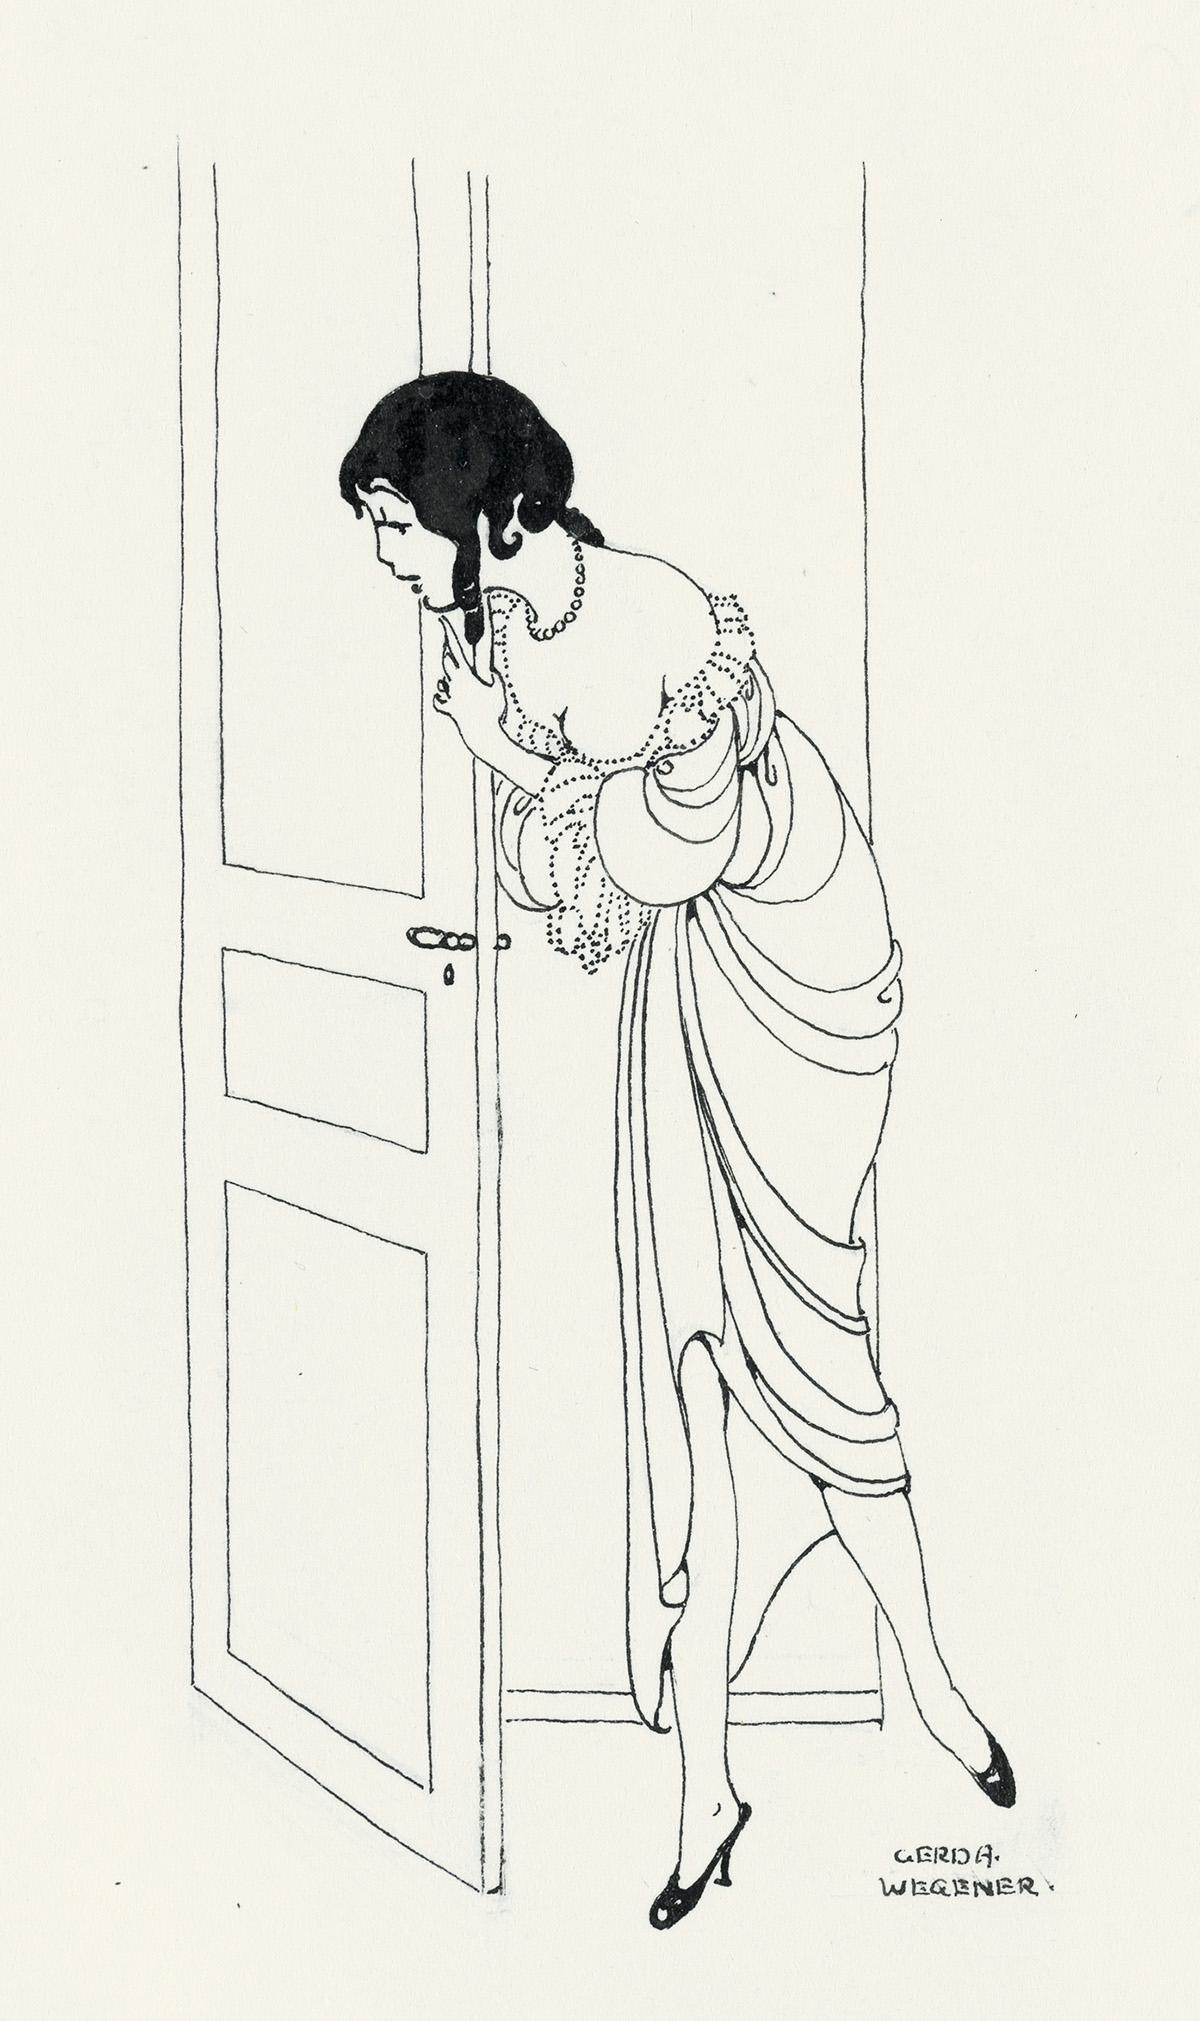 ADVERTISING-FASHION-GERDA-WEGENER-Peeking-around-the-door--W